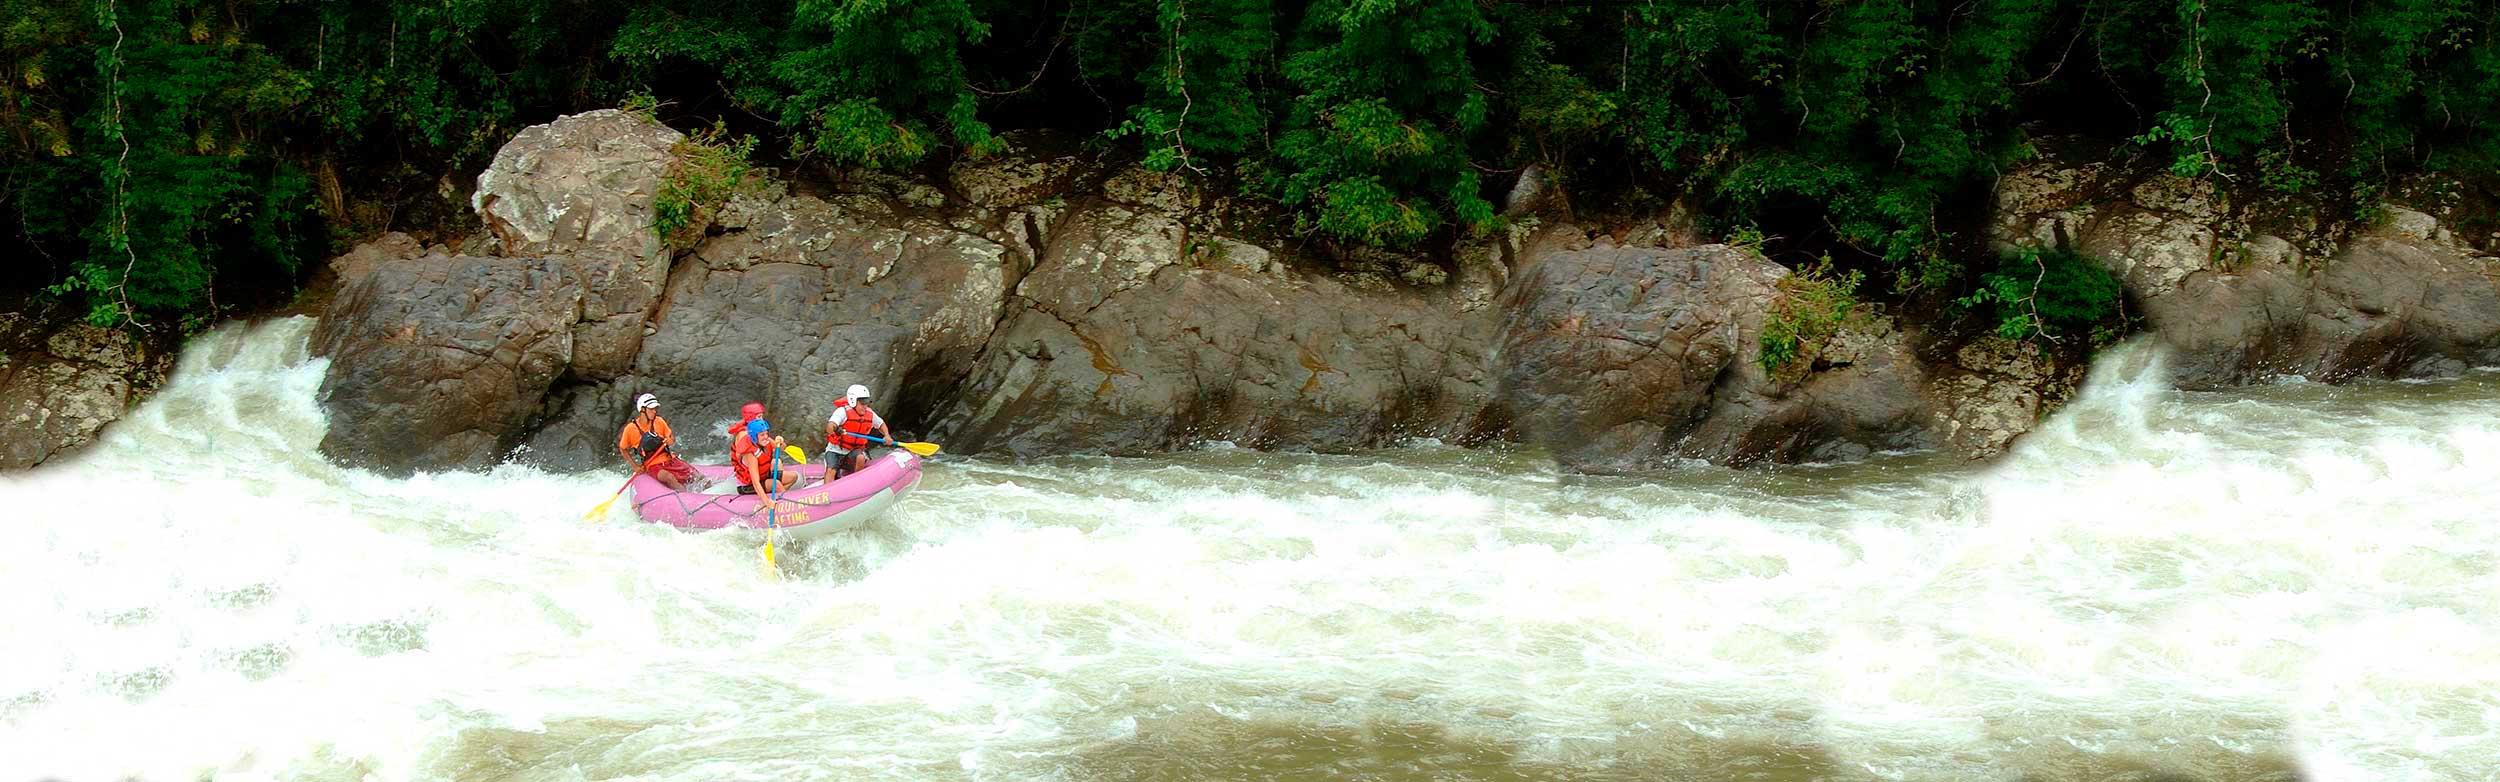 River Rafting in the Chiriqui Viejo